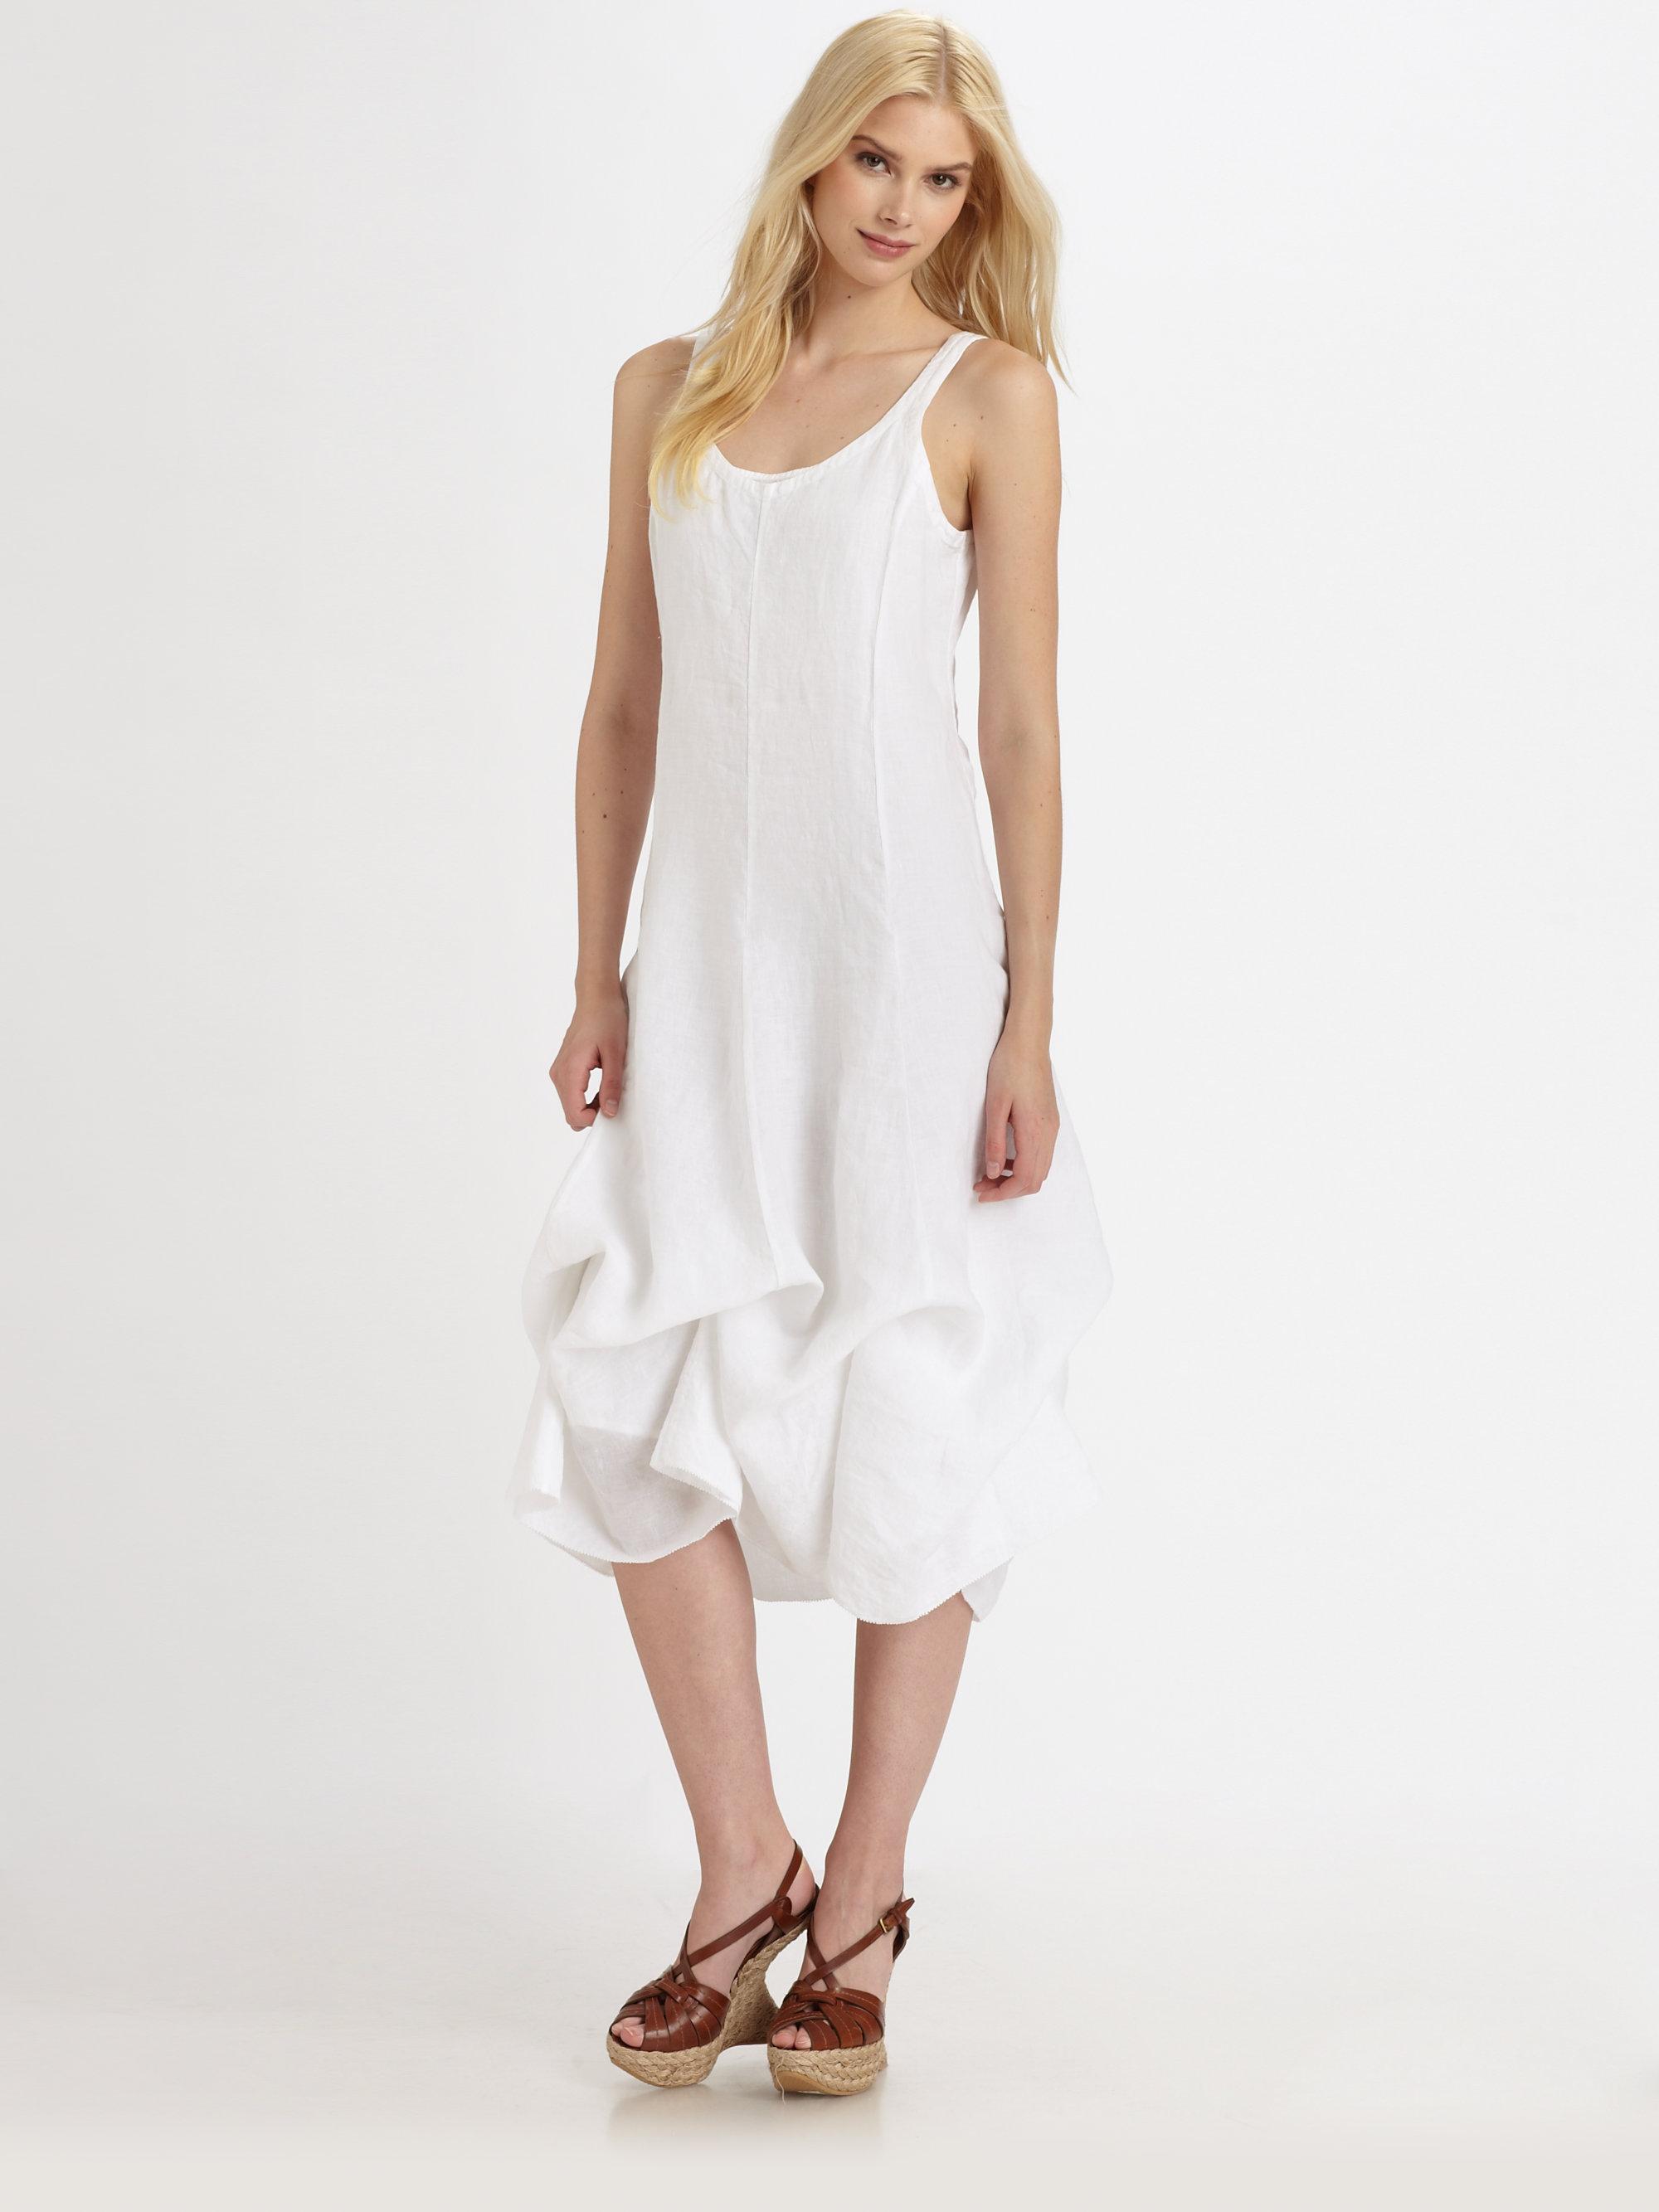 Lyst Eileen Fisher Handkerchief Linen Dress In White